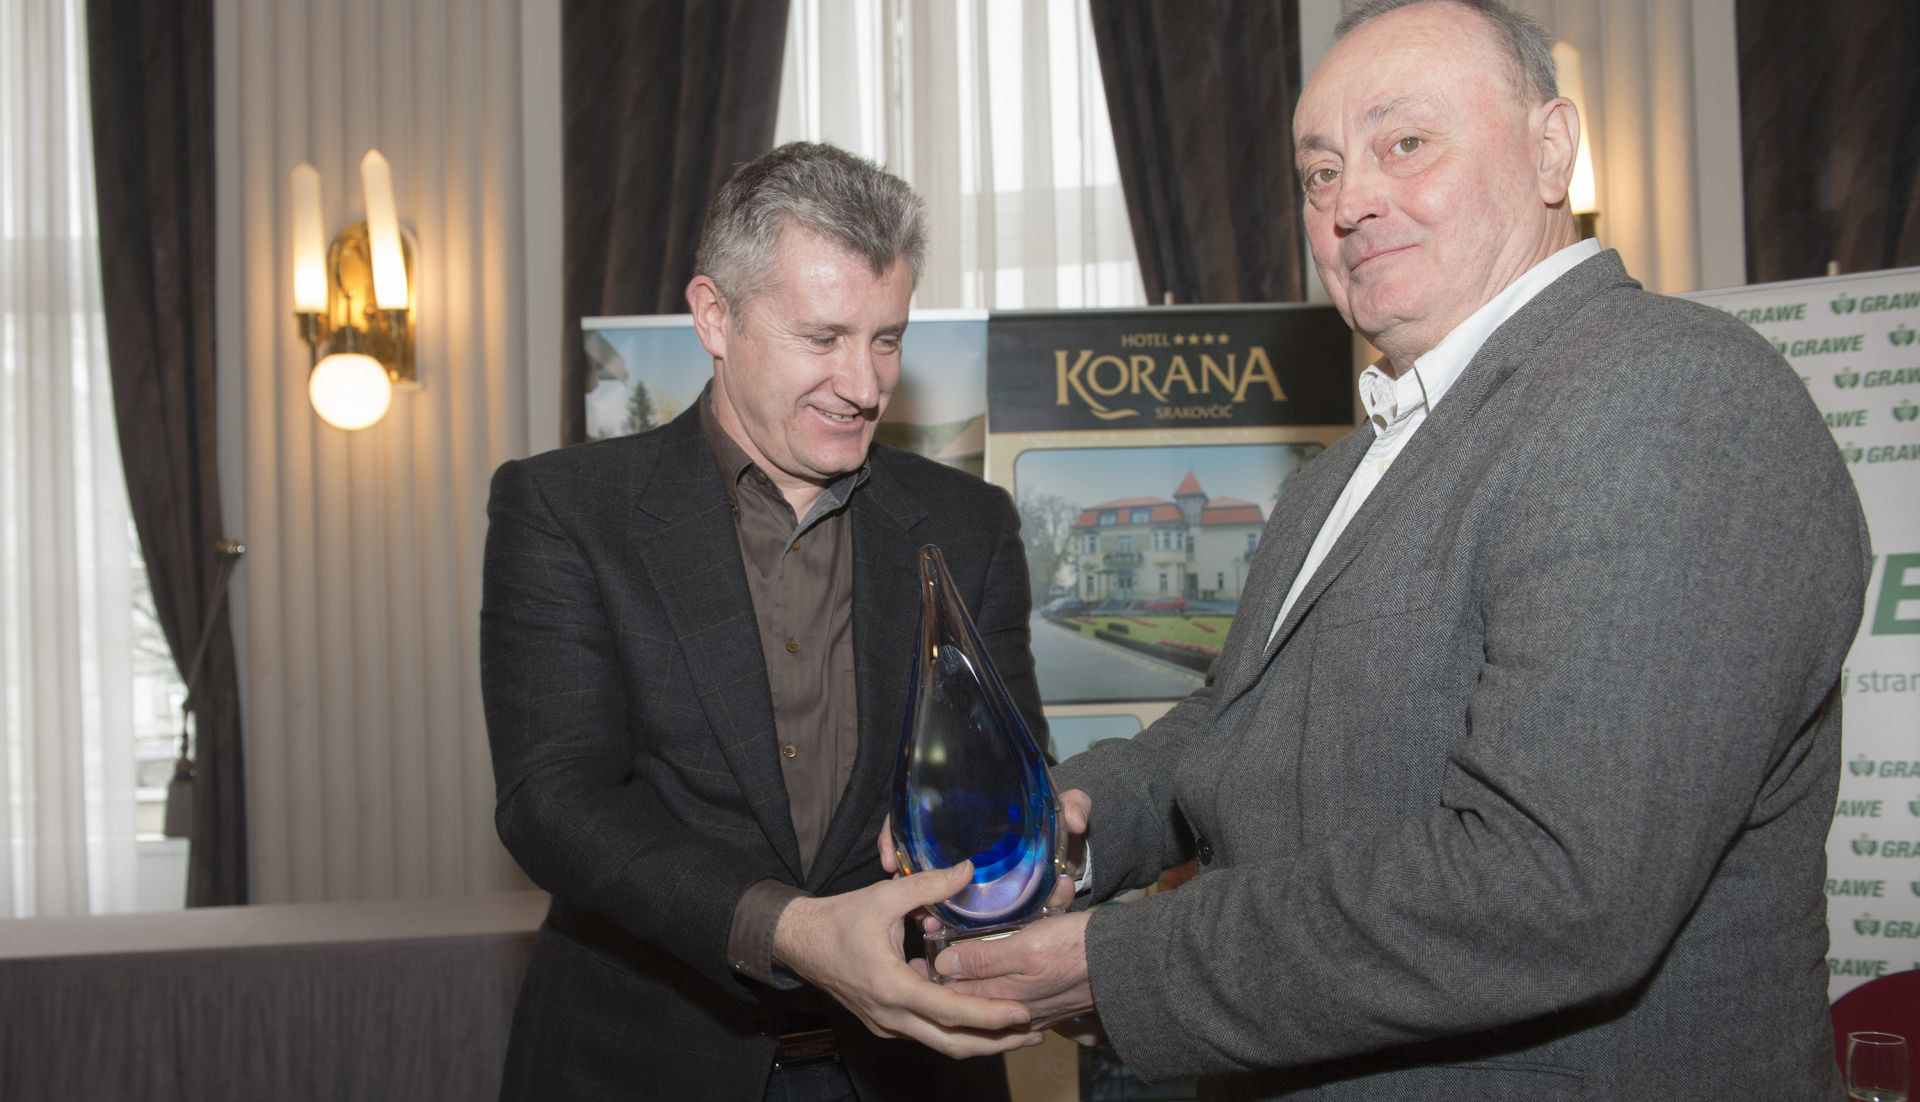 Umro sportski novinar Tomislav Židak